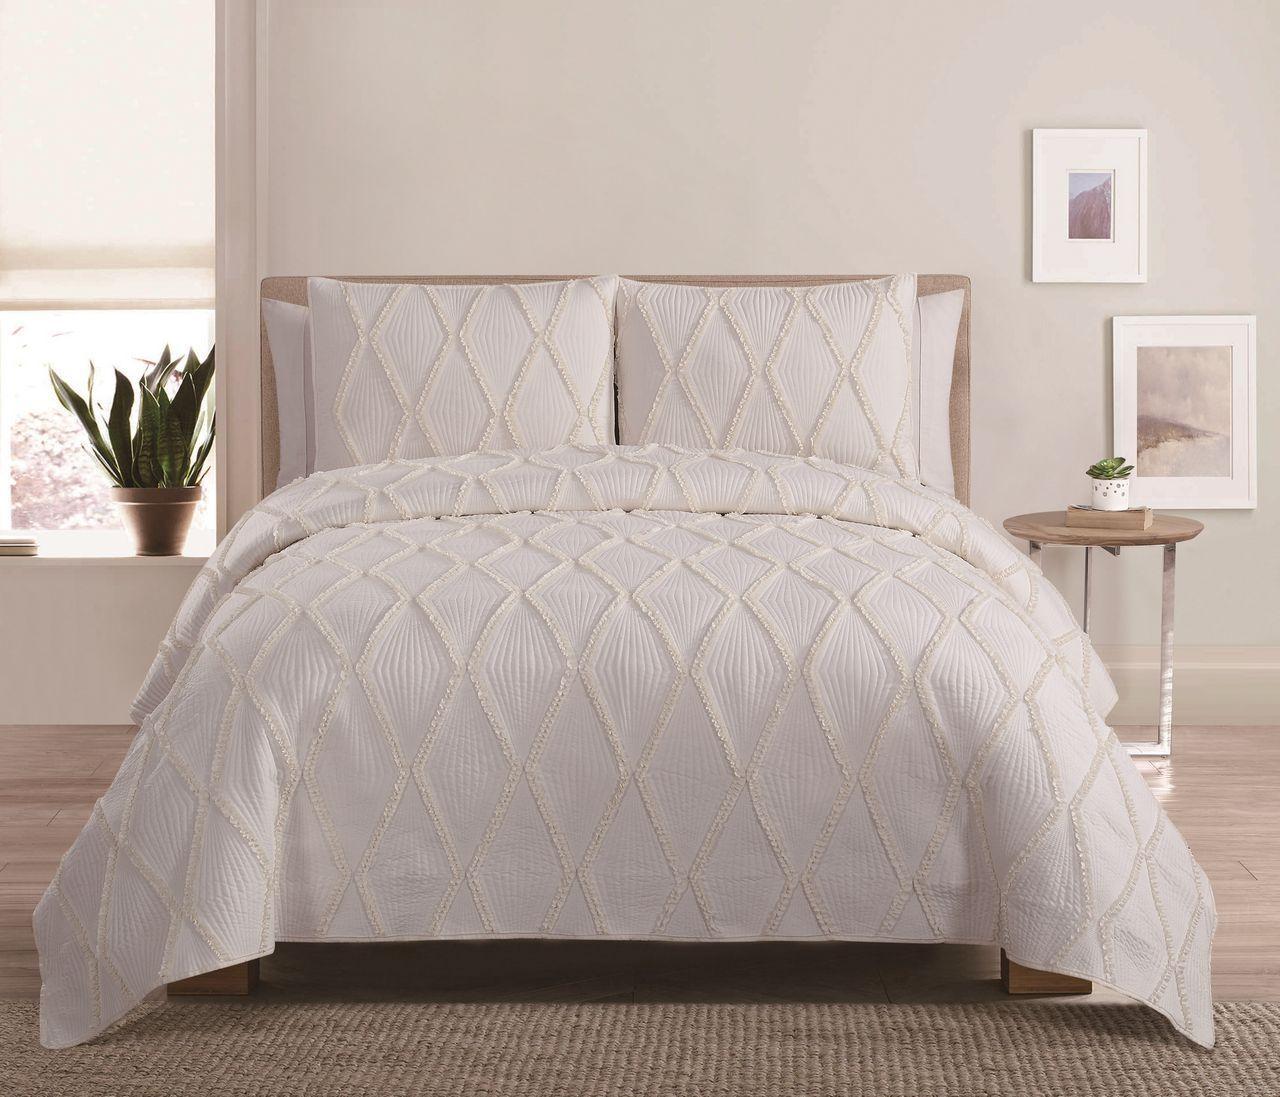 4 Piece Diamond Ruffle Ivory Quilt Set | Bedrooms | Pinterest ... : ivory quilt set - Adamdwight.com